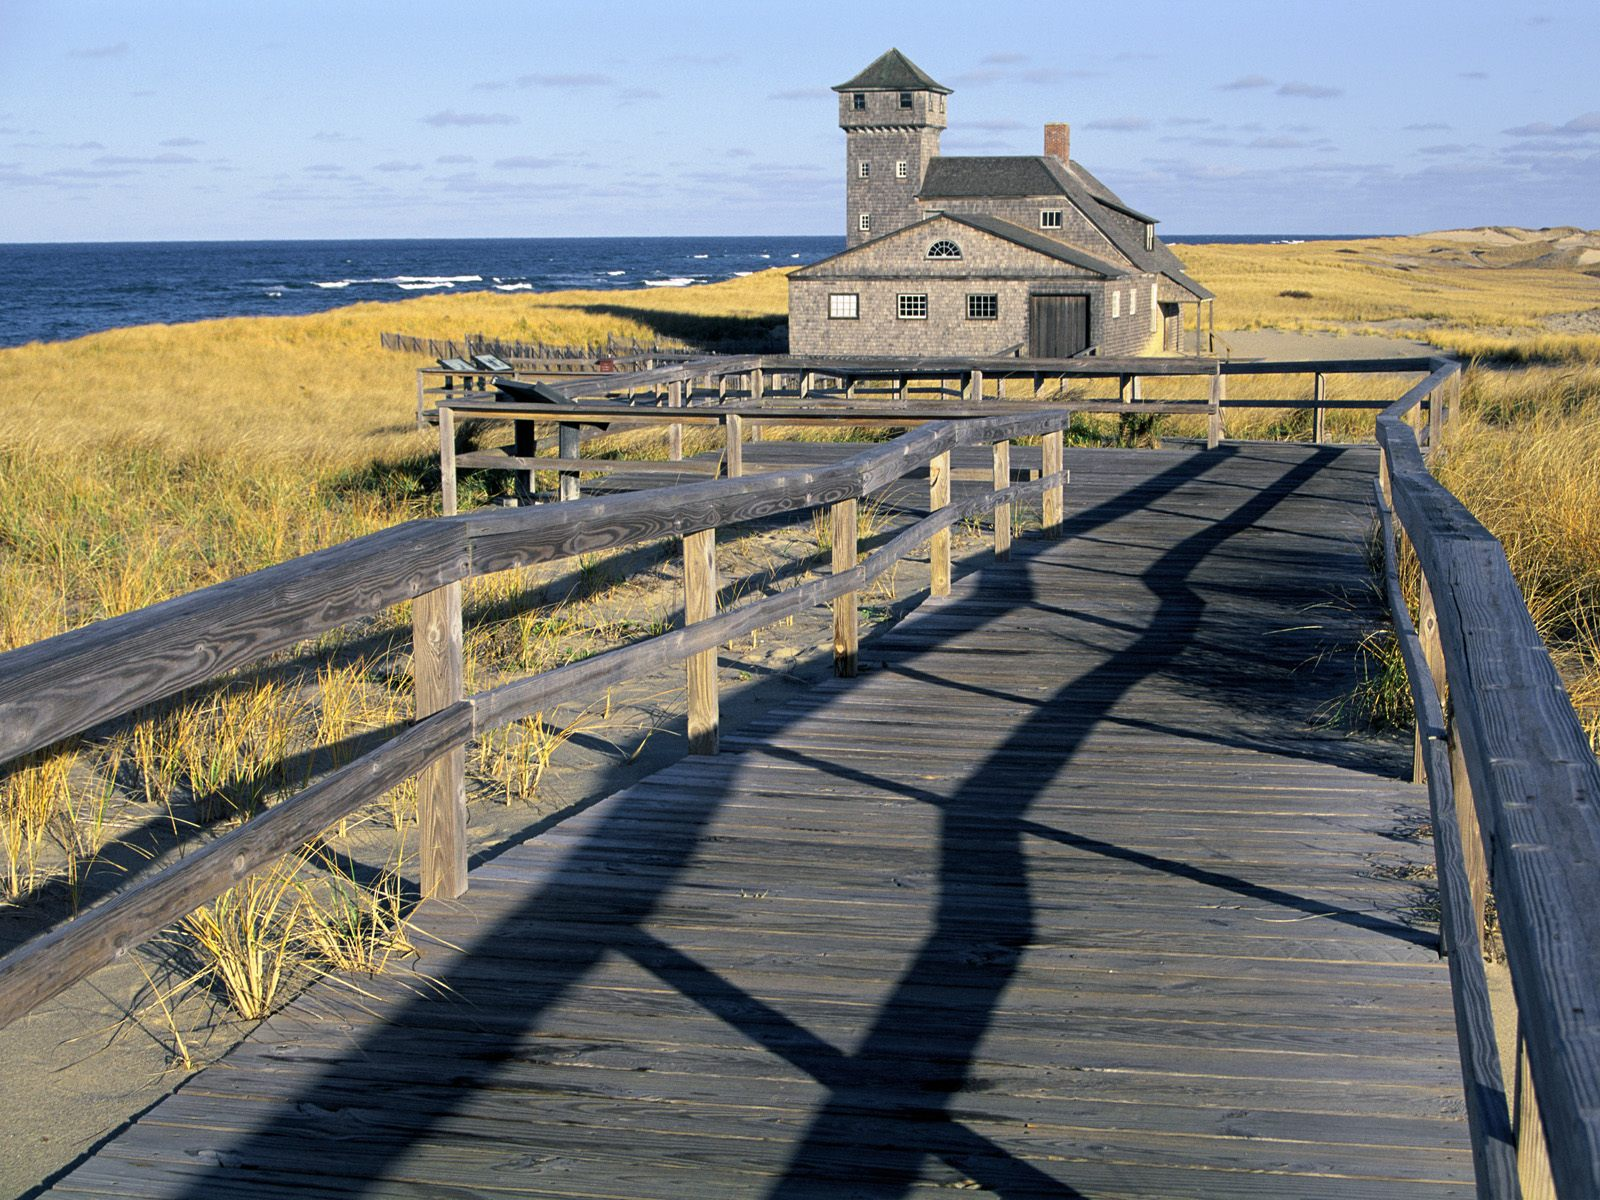 LARRY'S RAMBLE: Cape Cod National Seashore